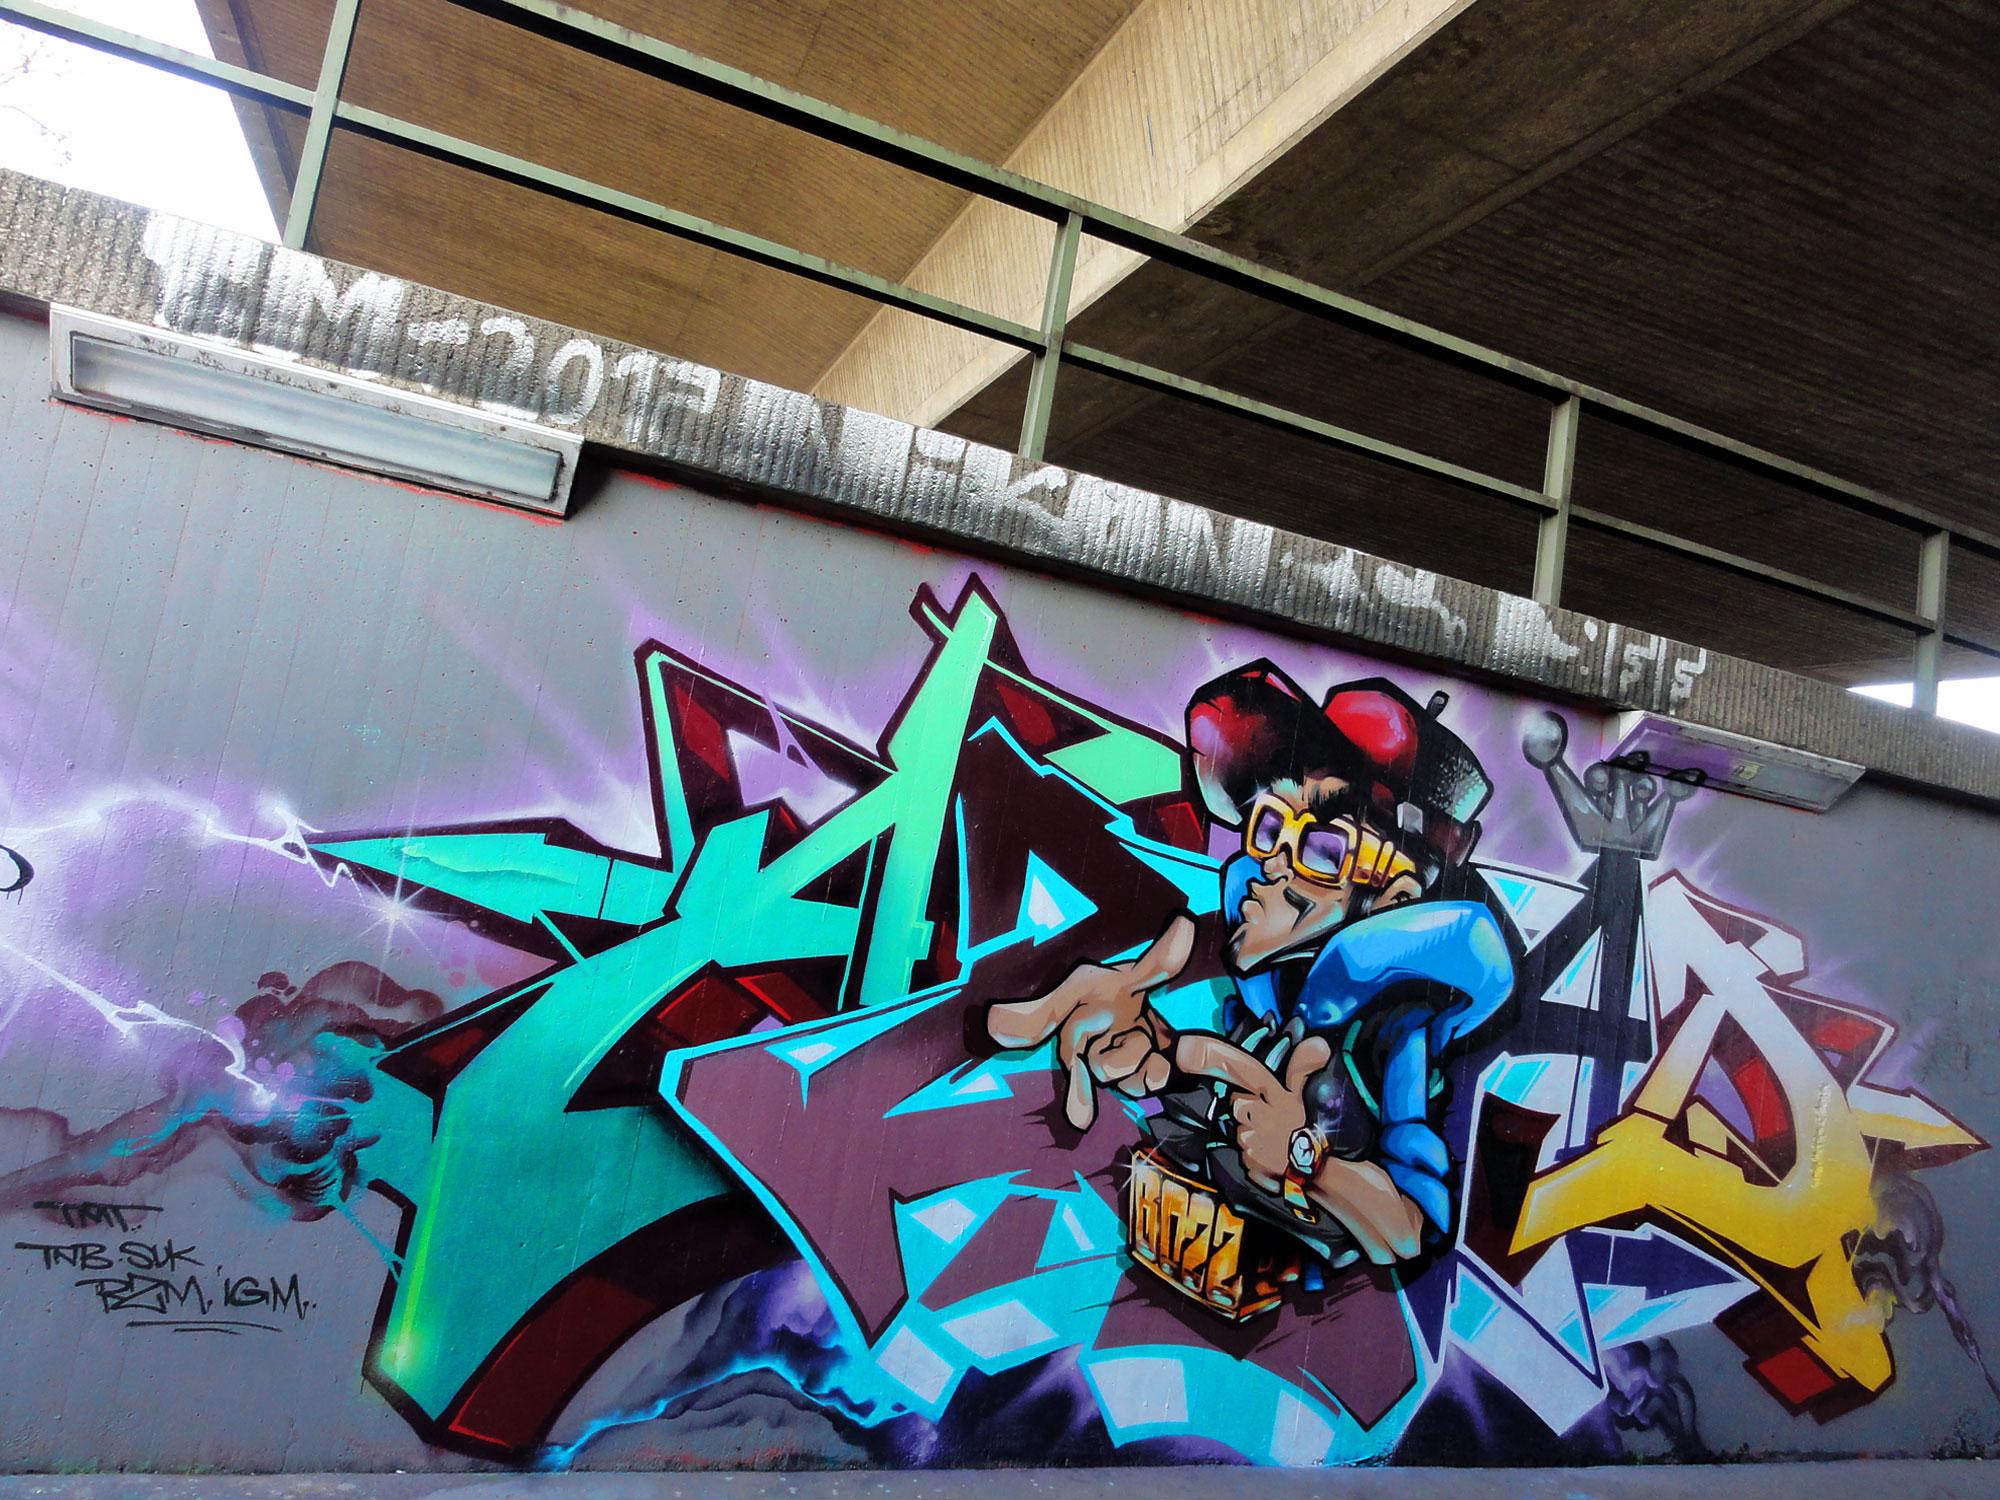 azad-leben-2-graffiti-frankfurt